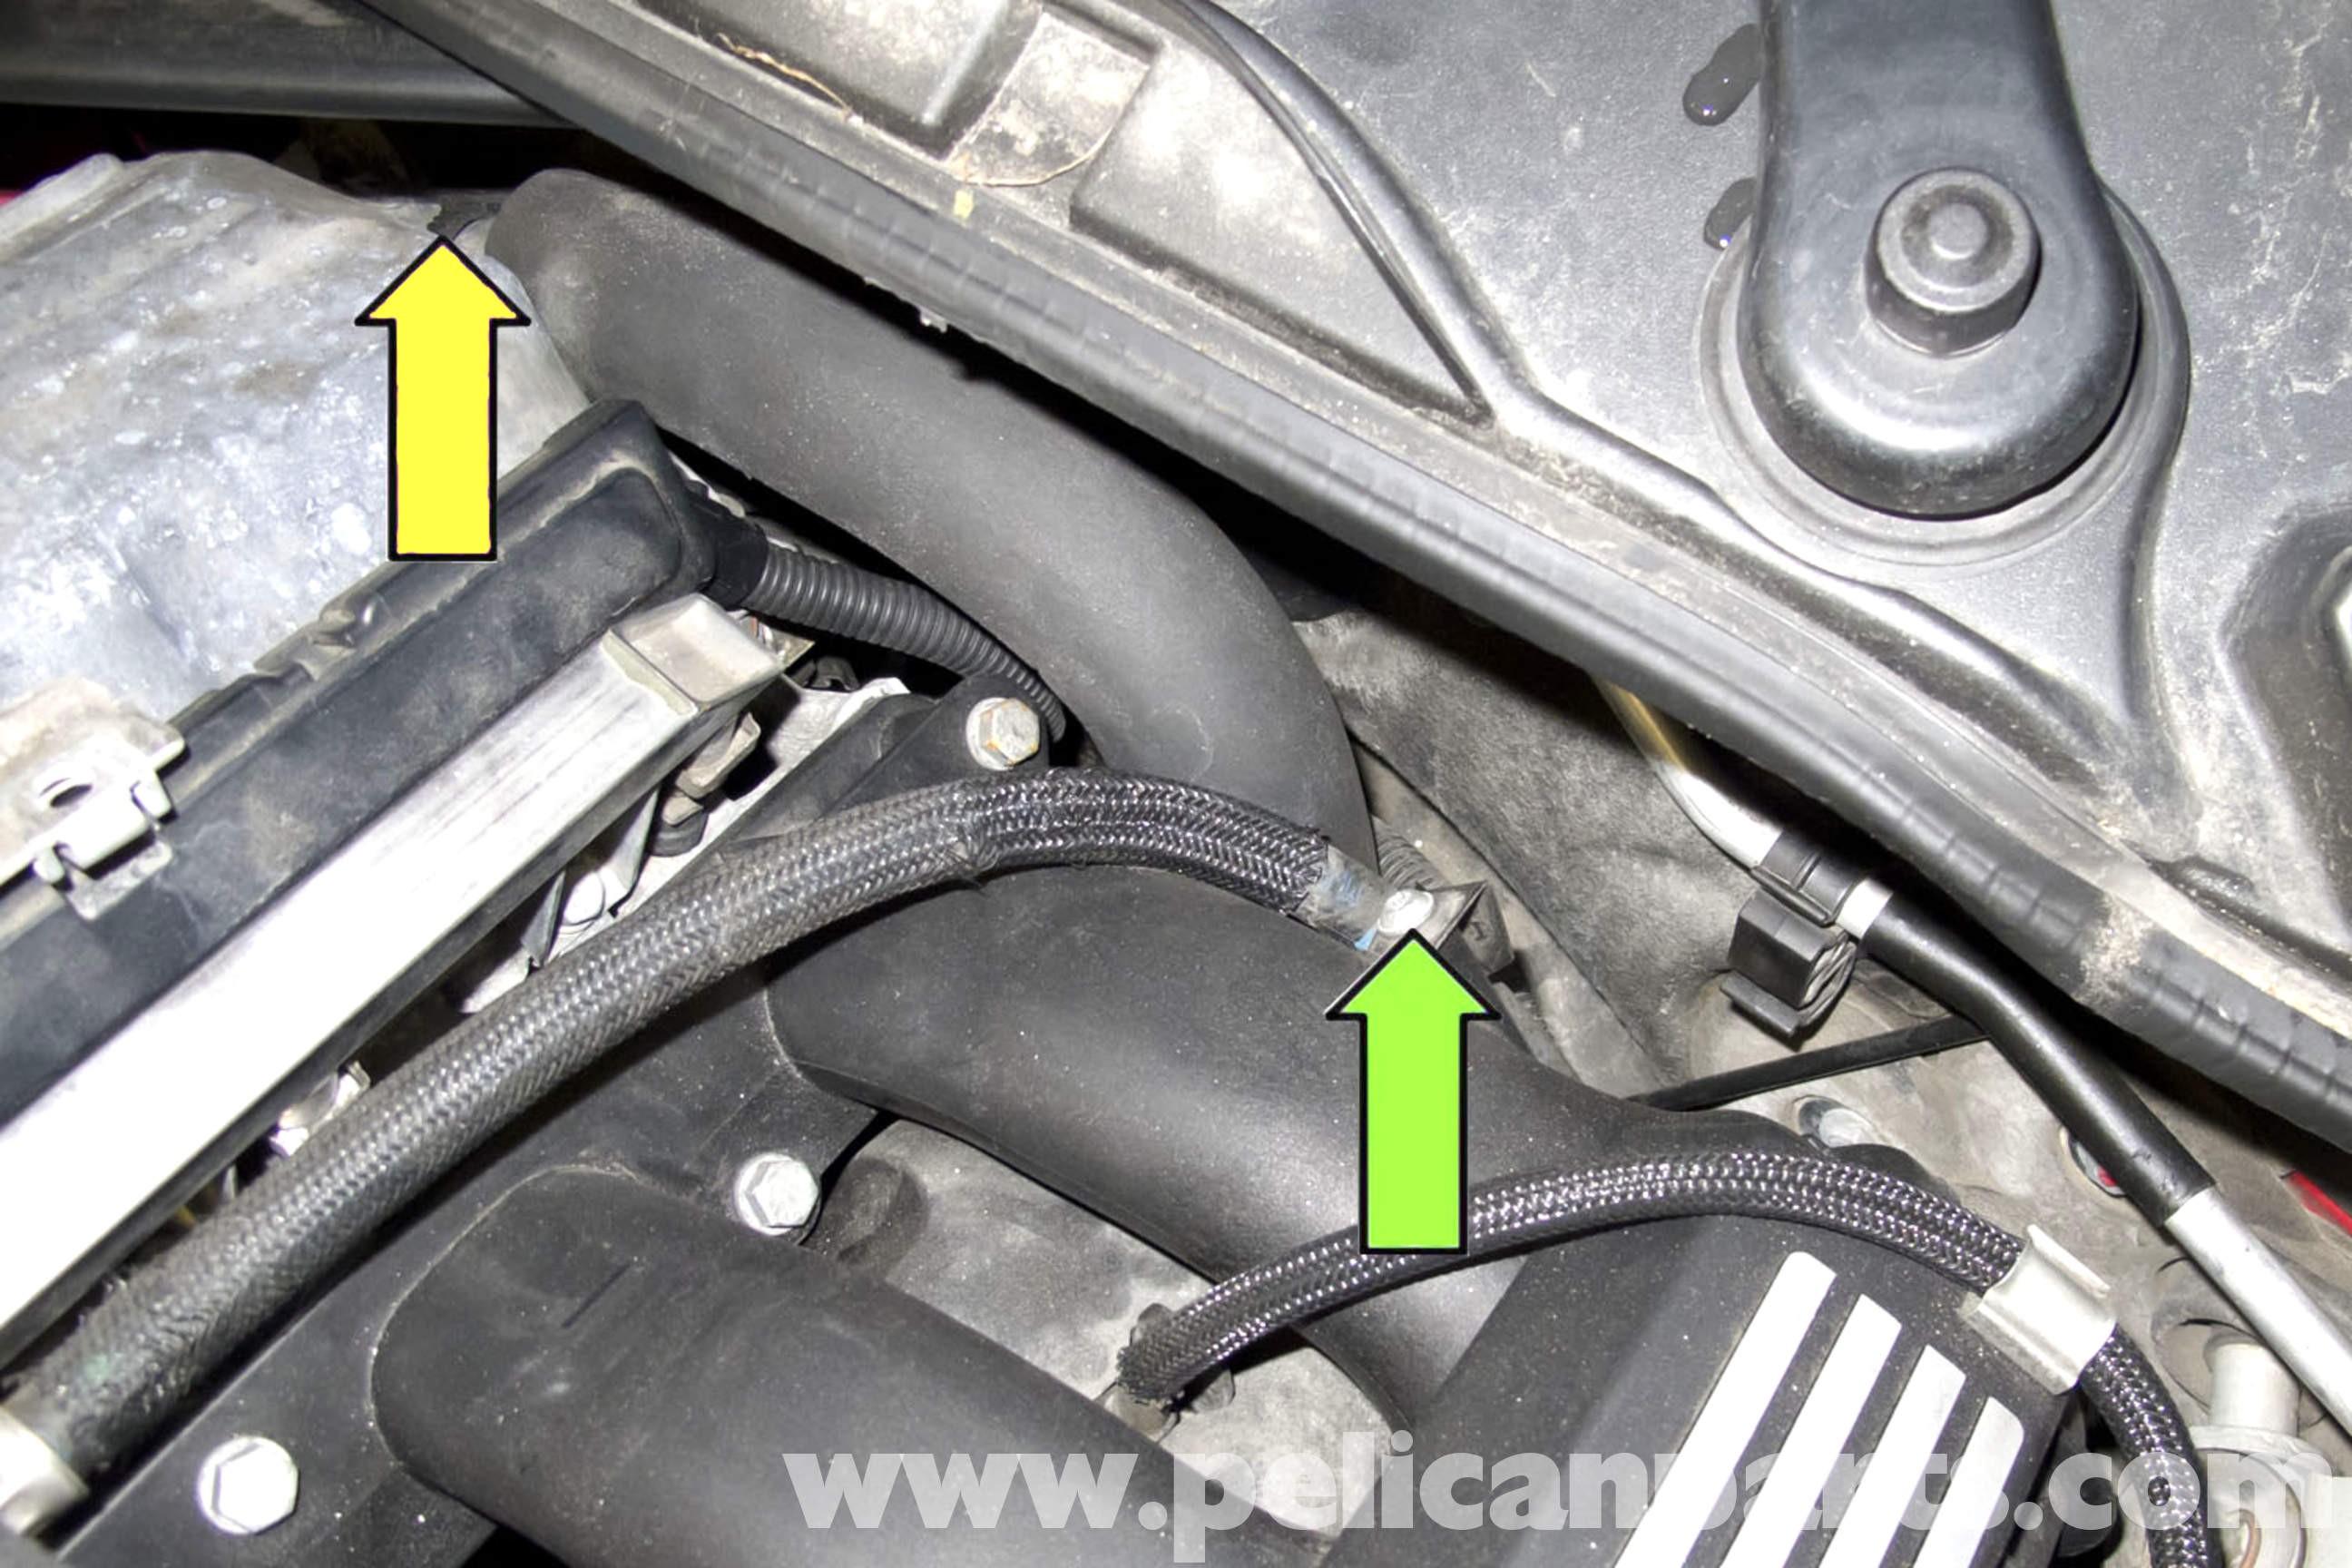 2006 Bmw 325i Engine Diagram Bmw E90 Intake Manifold Replacement E91 E92 E93 Of 2006 Bmw 325i Engine Diagram